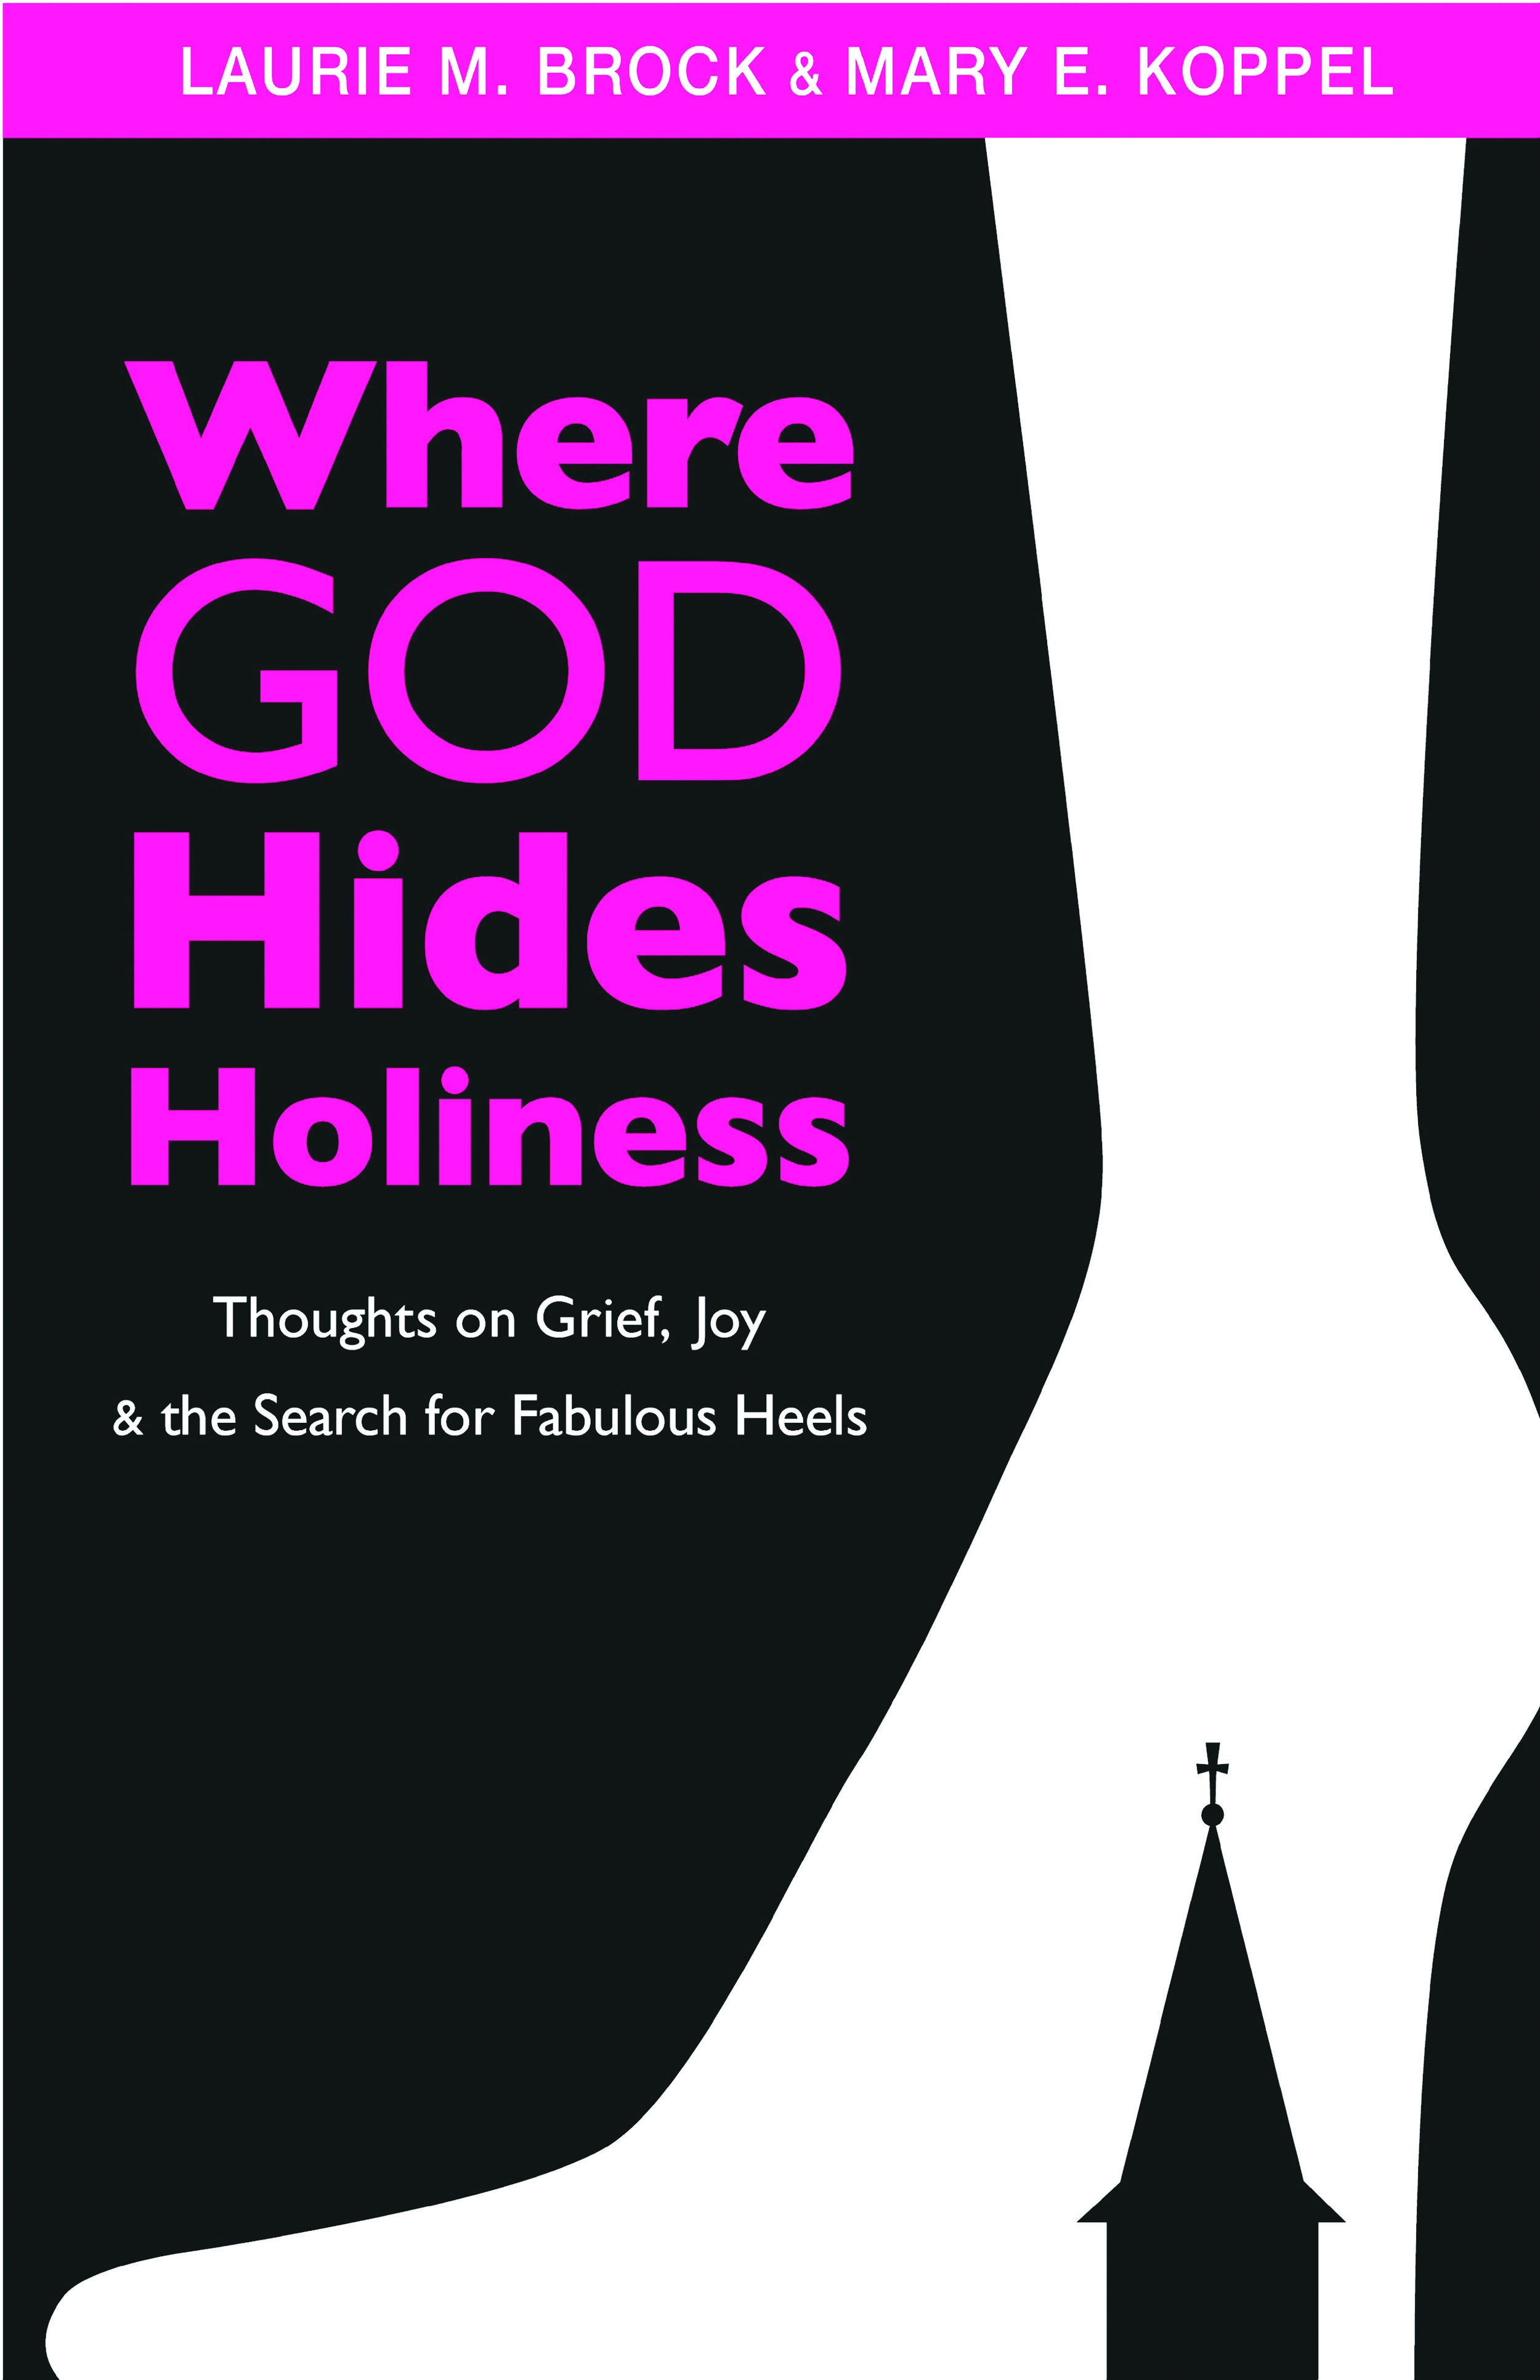 Where God Hides Holiness